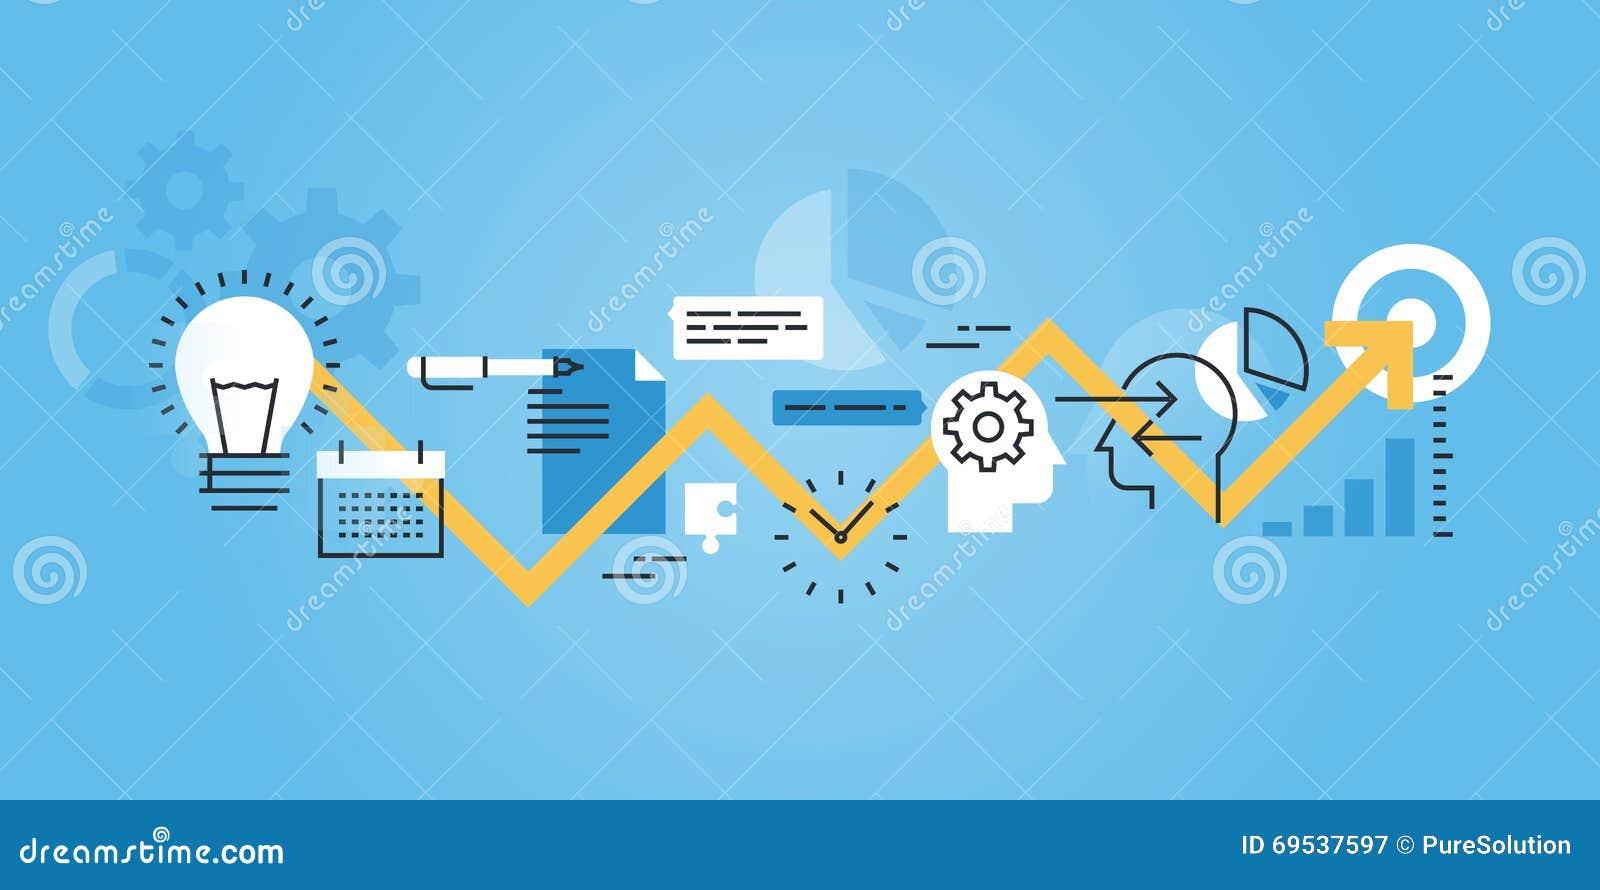 Vector Illustration Web Designs: Flat Line Design Website Banner Of Development Process